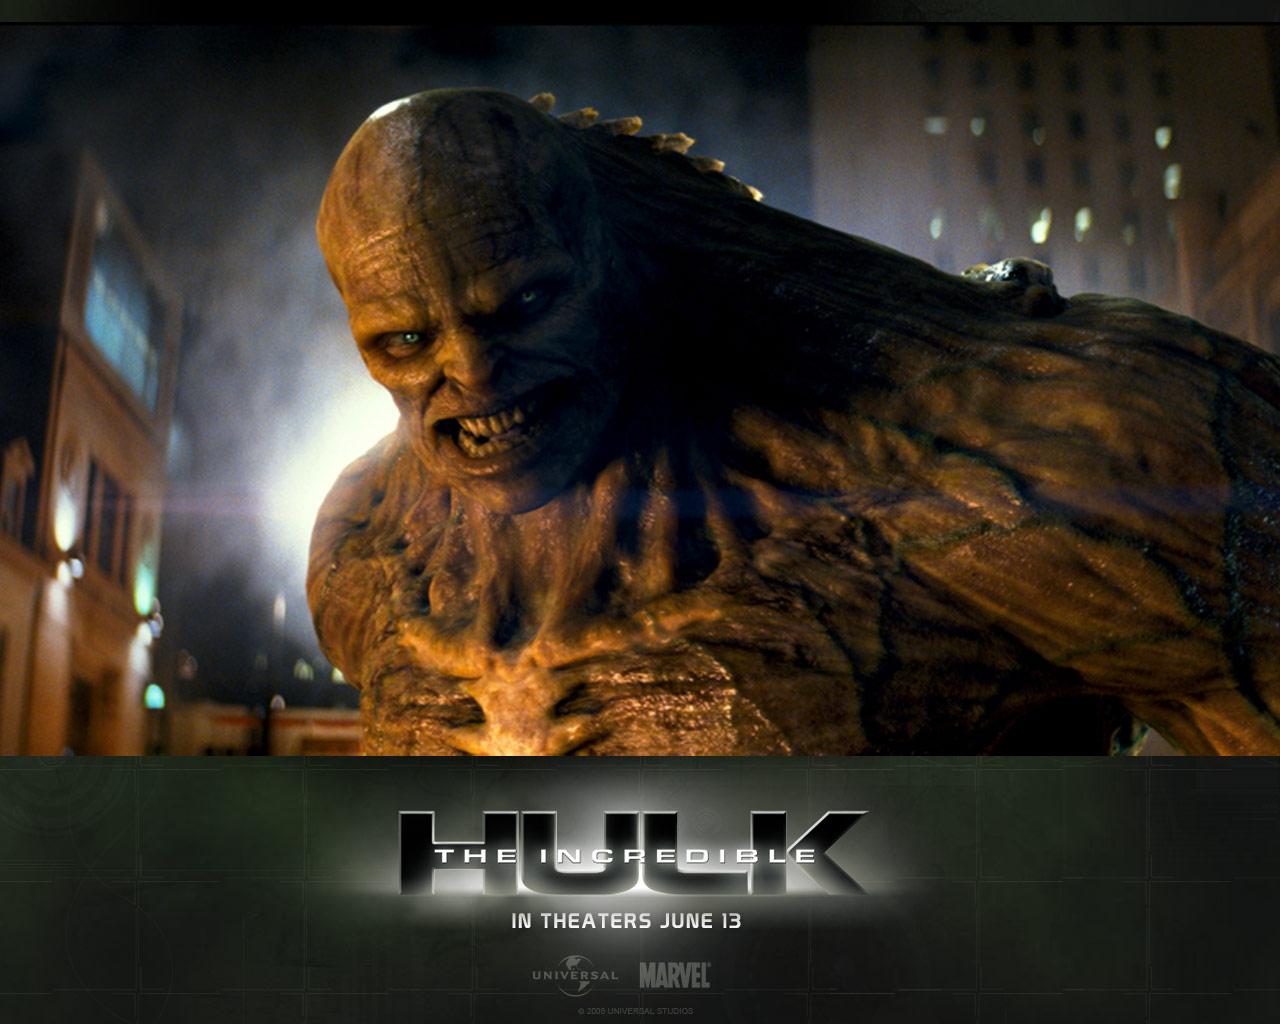 HQ The Incredible Hulk Wallpaper Num 9 1280 X 1024 2042 Kb